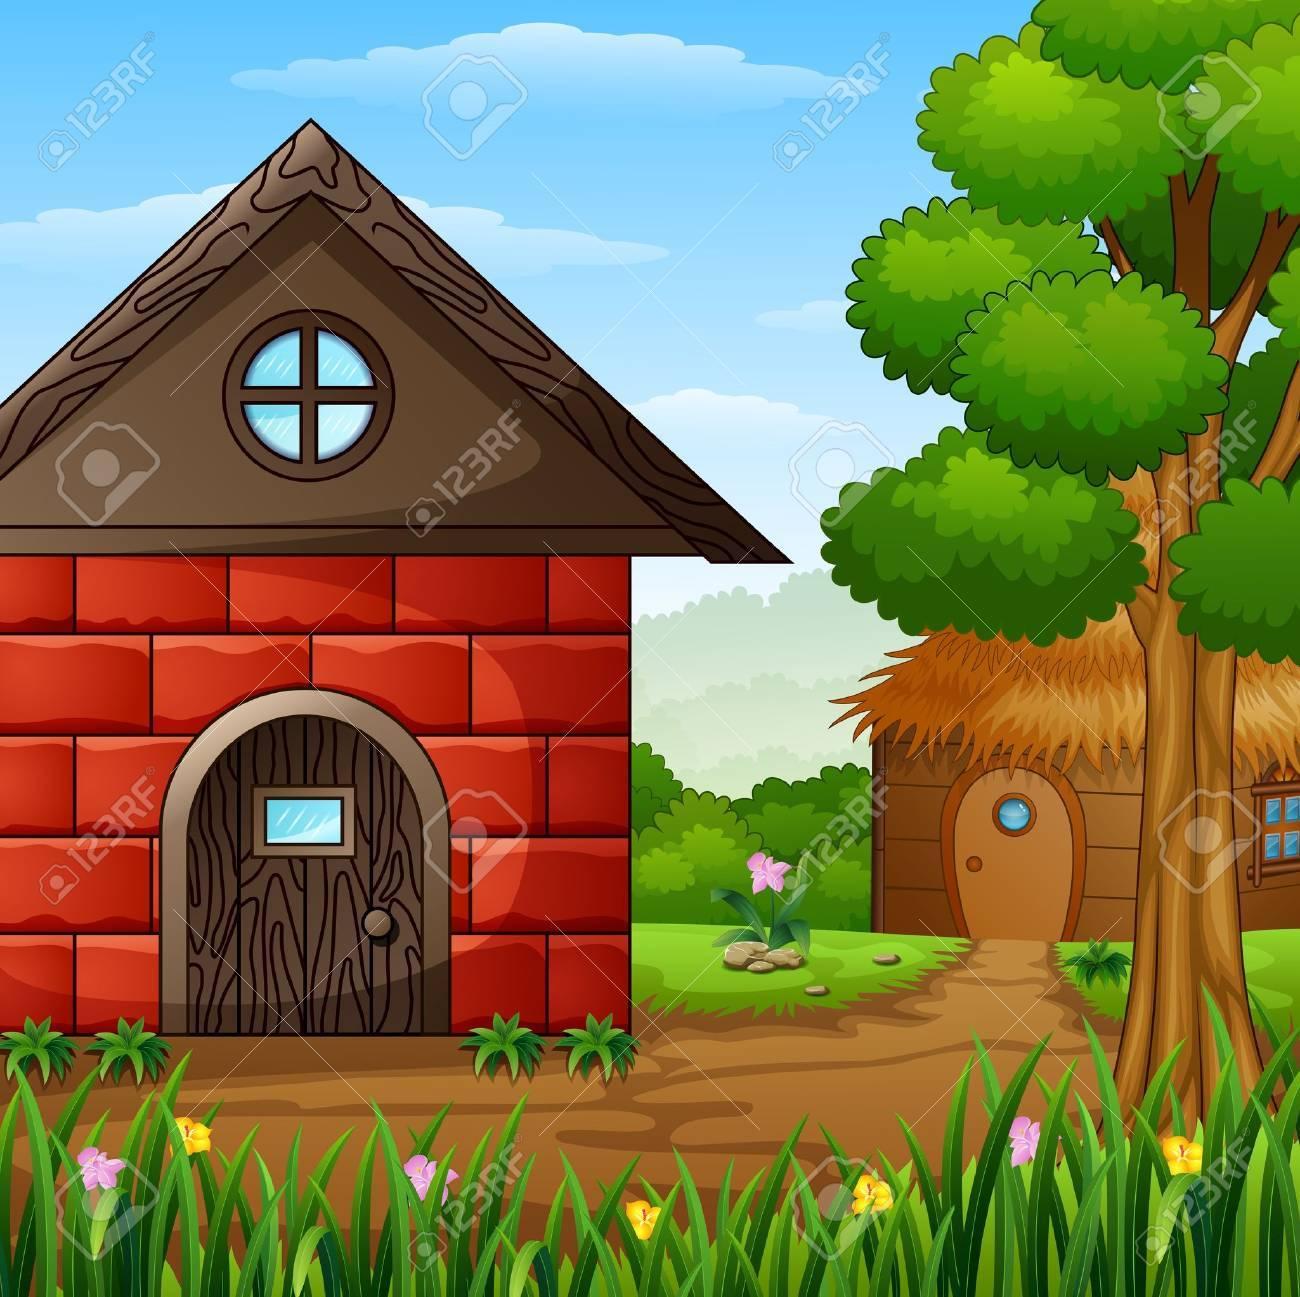 Cartoon barnhouse with a cabin in the farmland - 78420371